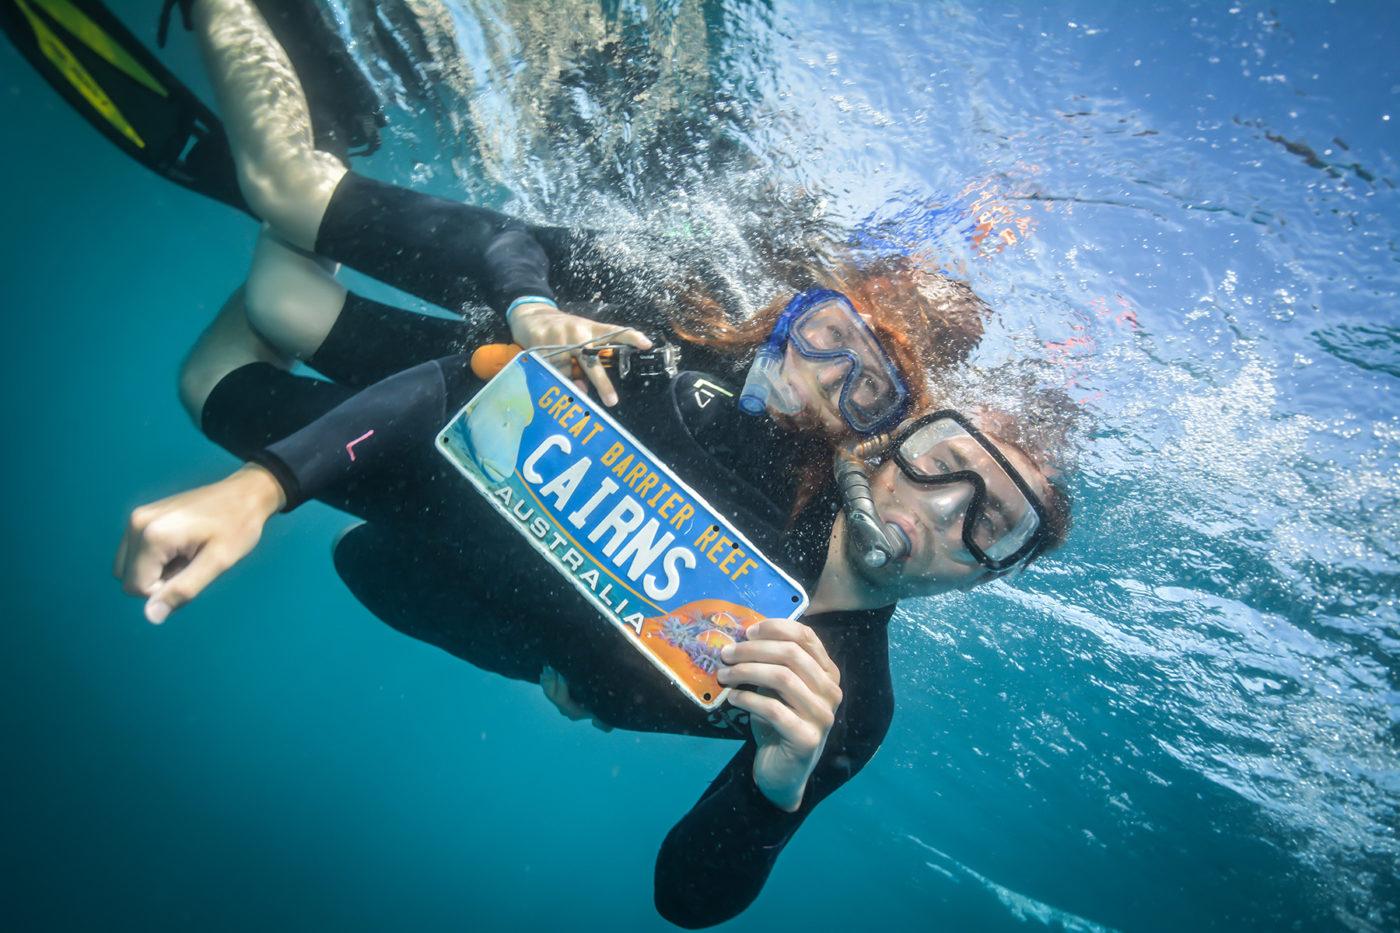 great barrier reef, tusa6, ausflug, tagesausflug, schnorcheln, riff, rifftour, bootstour, bootsfahrt, australien, cairns